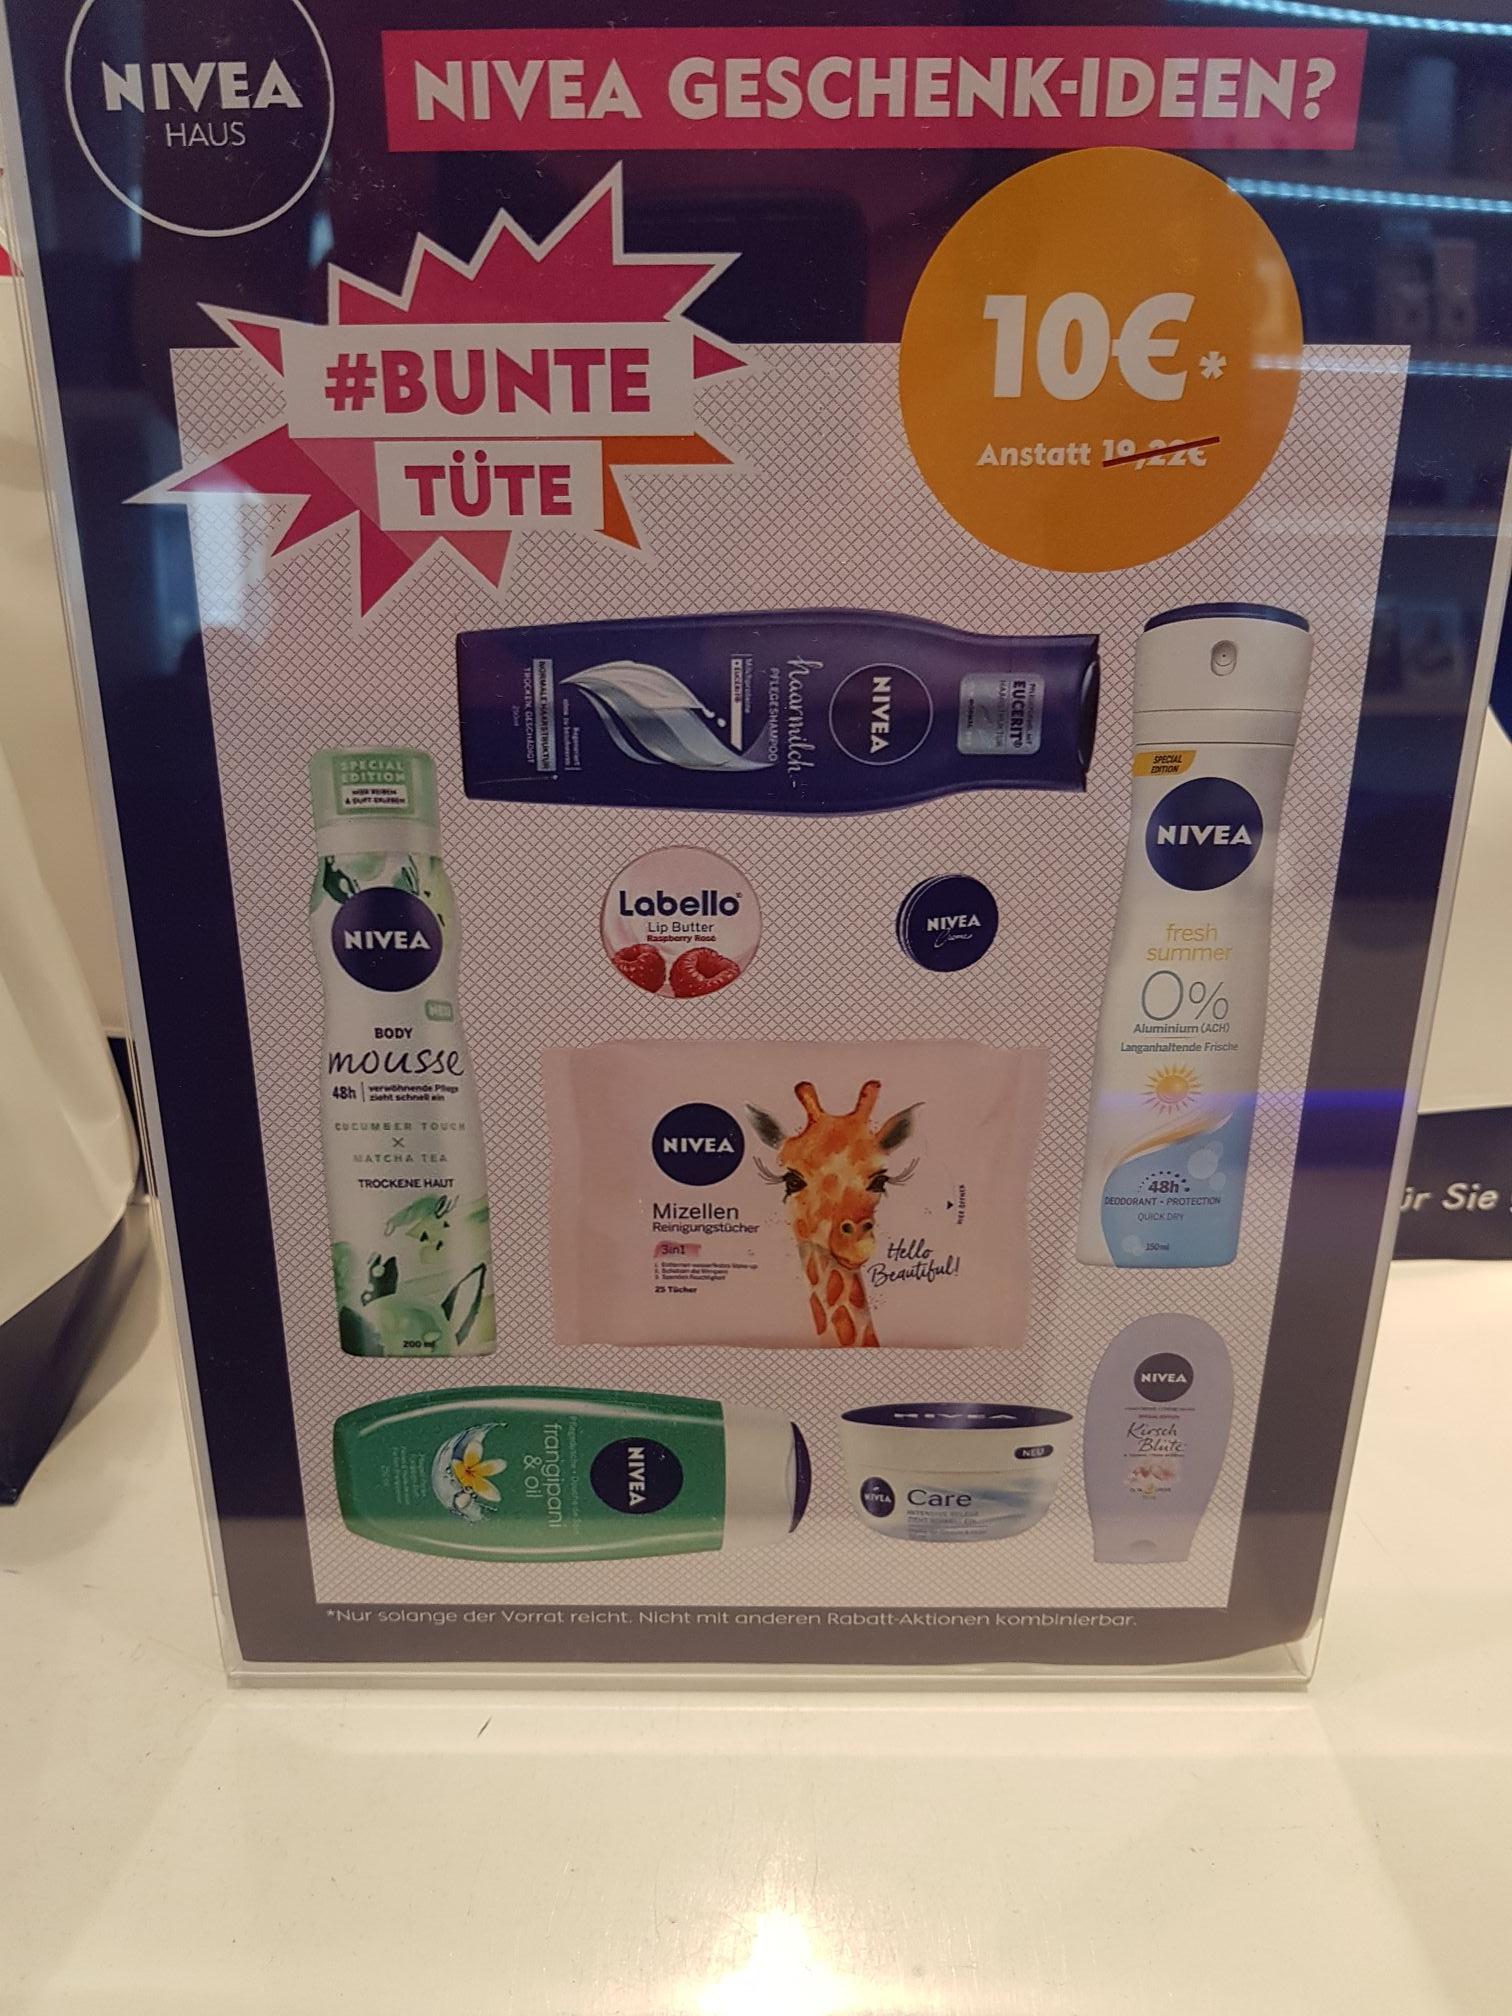 (LOKAL) Nivea Produkte Hamburg für 10 €